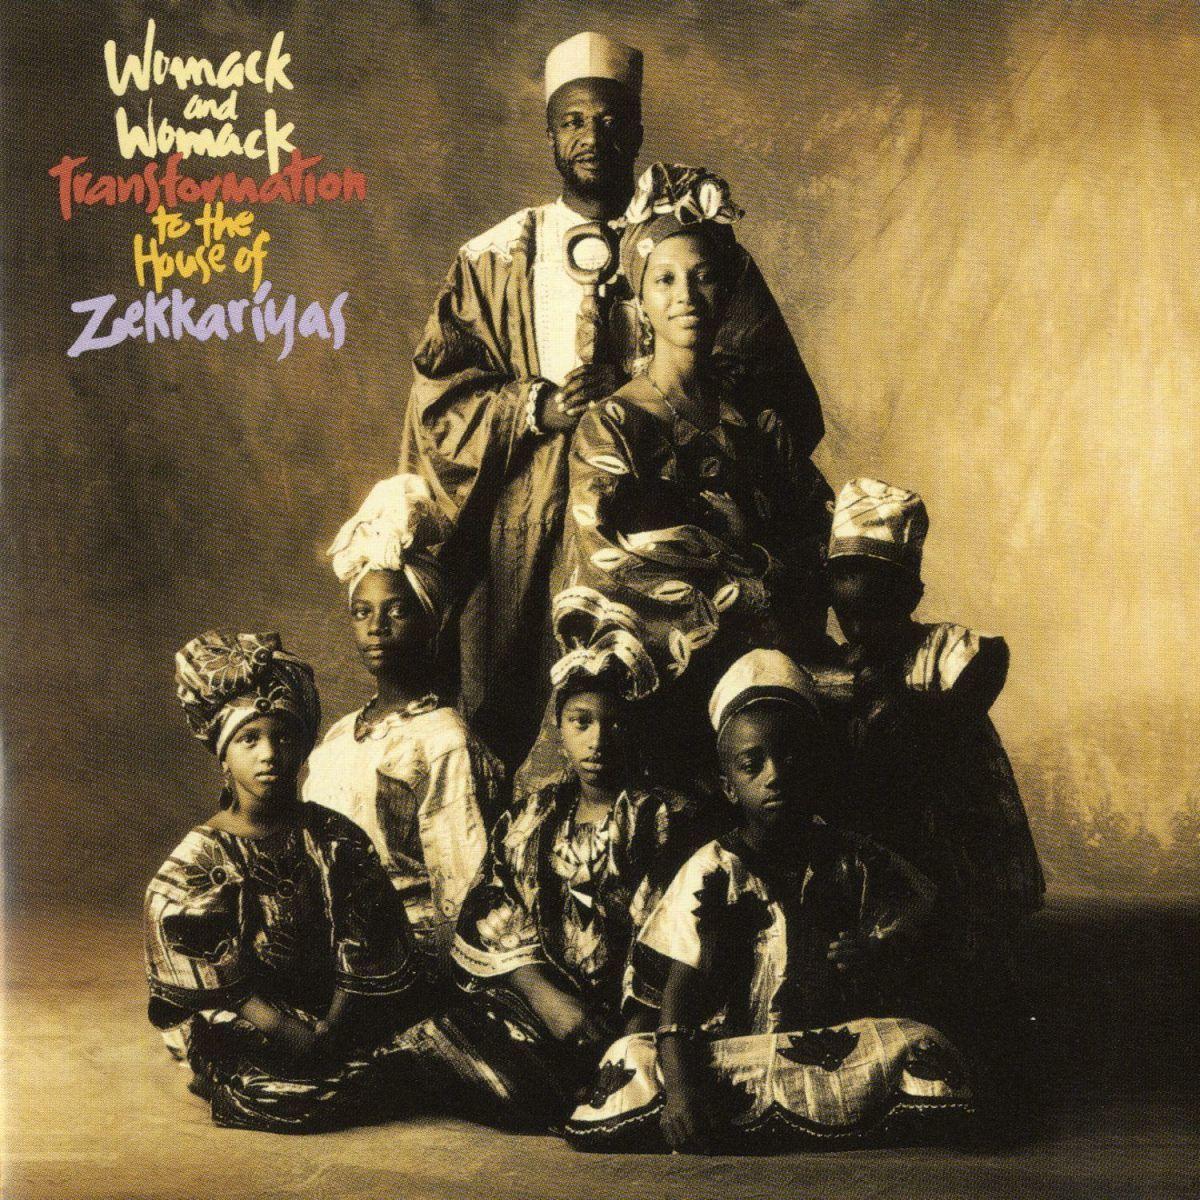 Womack & Womack - Secret Star (LP Version)